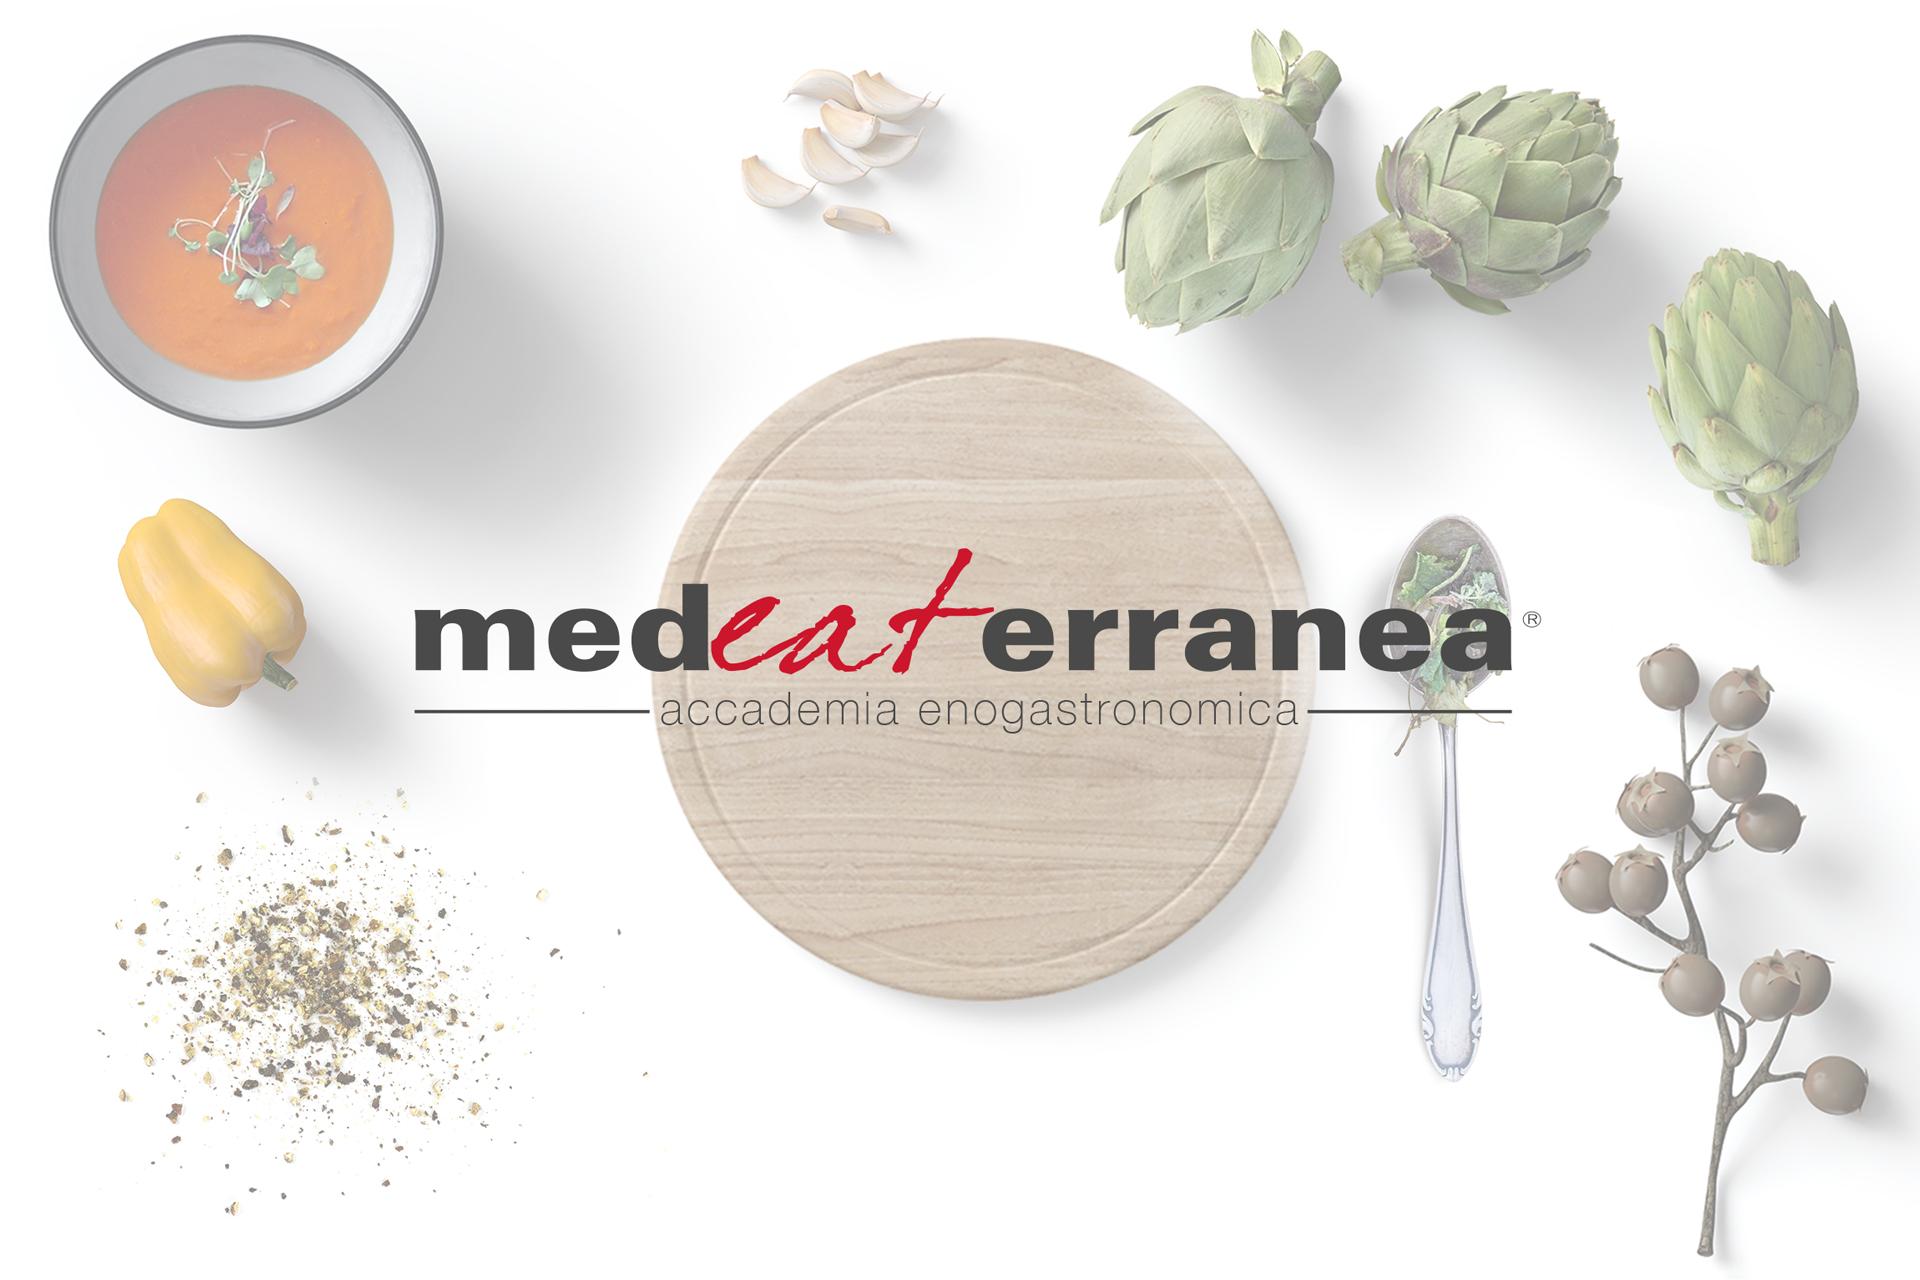 Libellula Grafica Lab - Medeaterranea - Cooking Academy